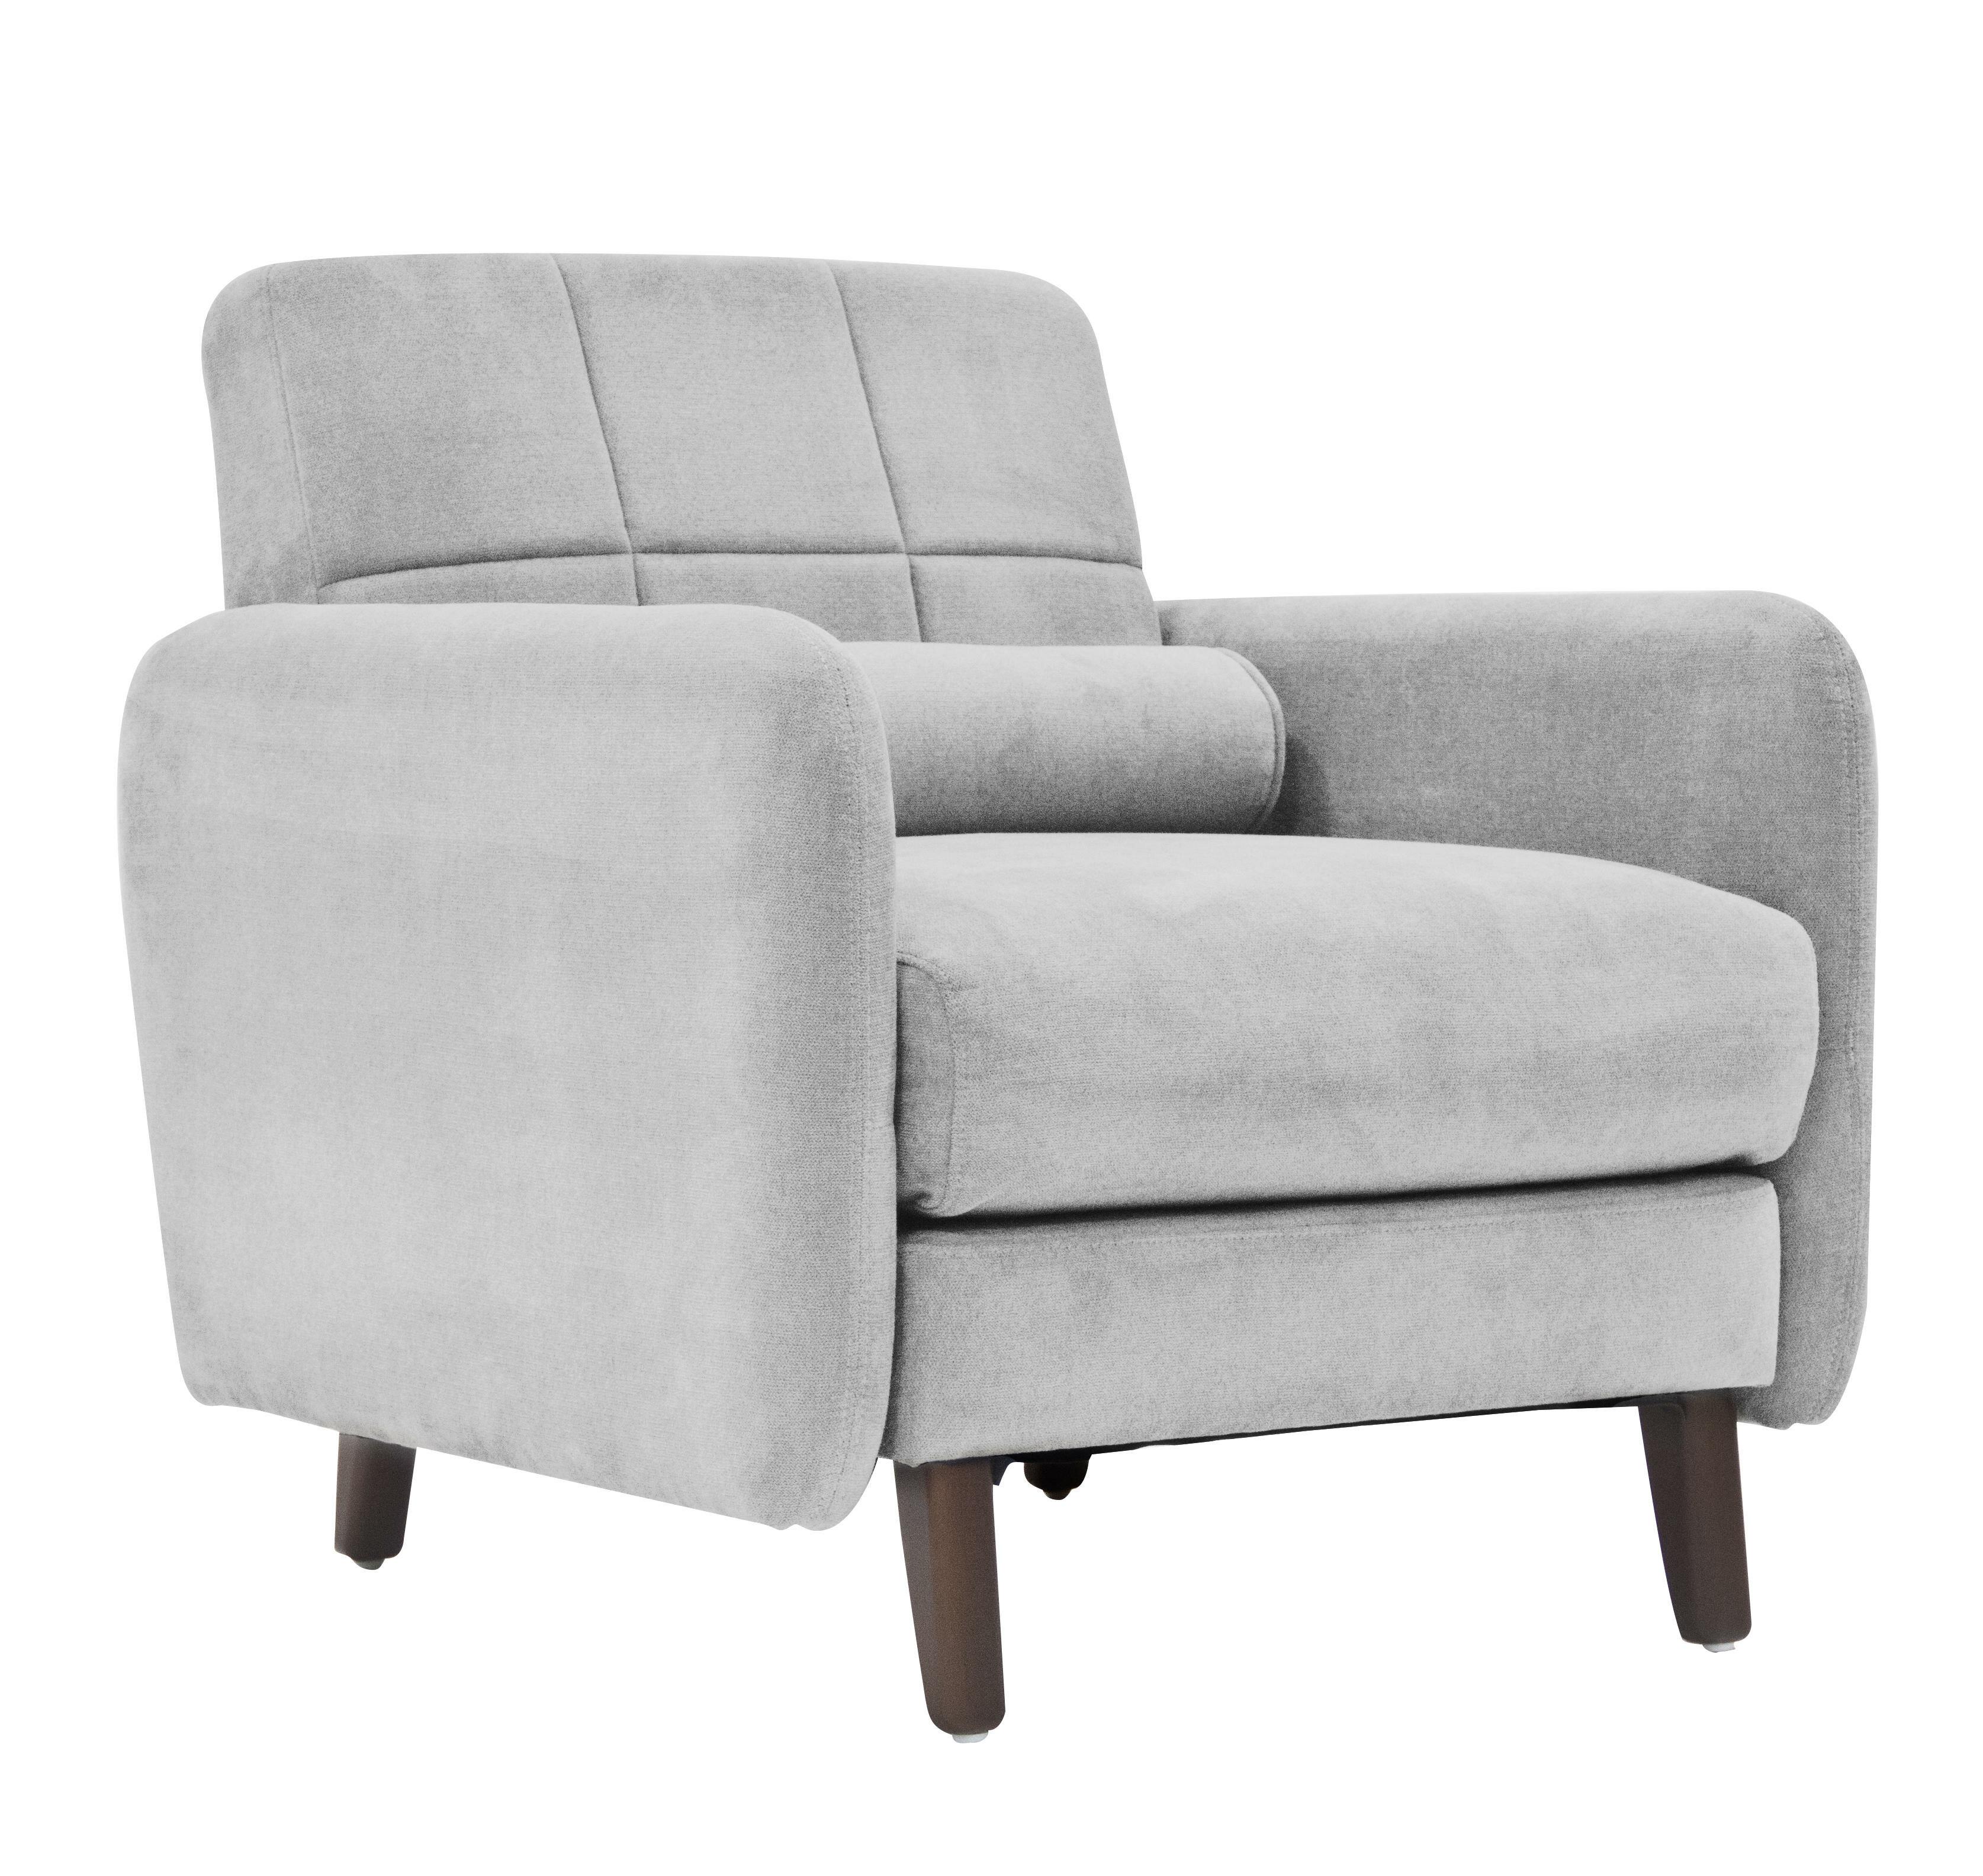 Serta At Home Savanna Configurable Living Room Set U0026 Reviews | Wayfair